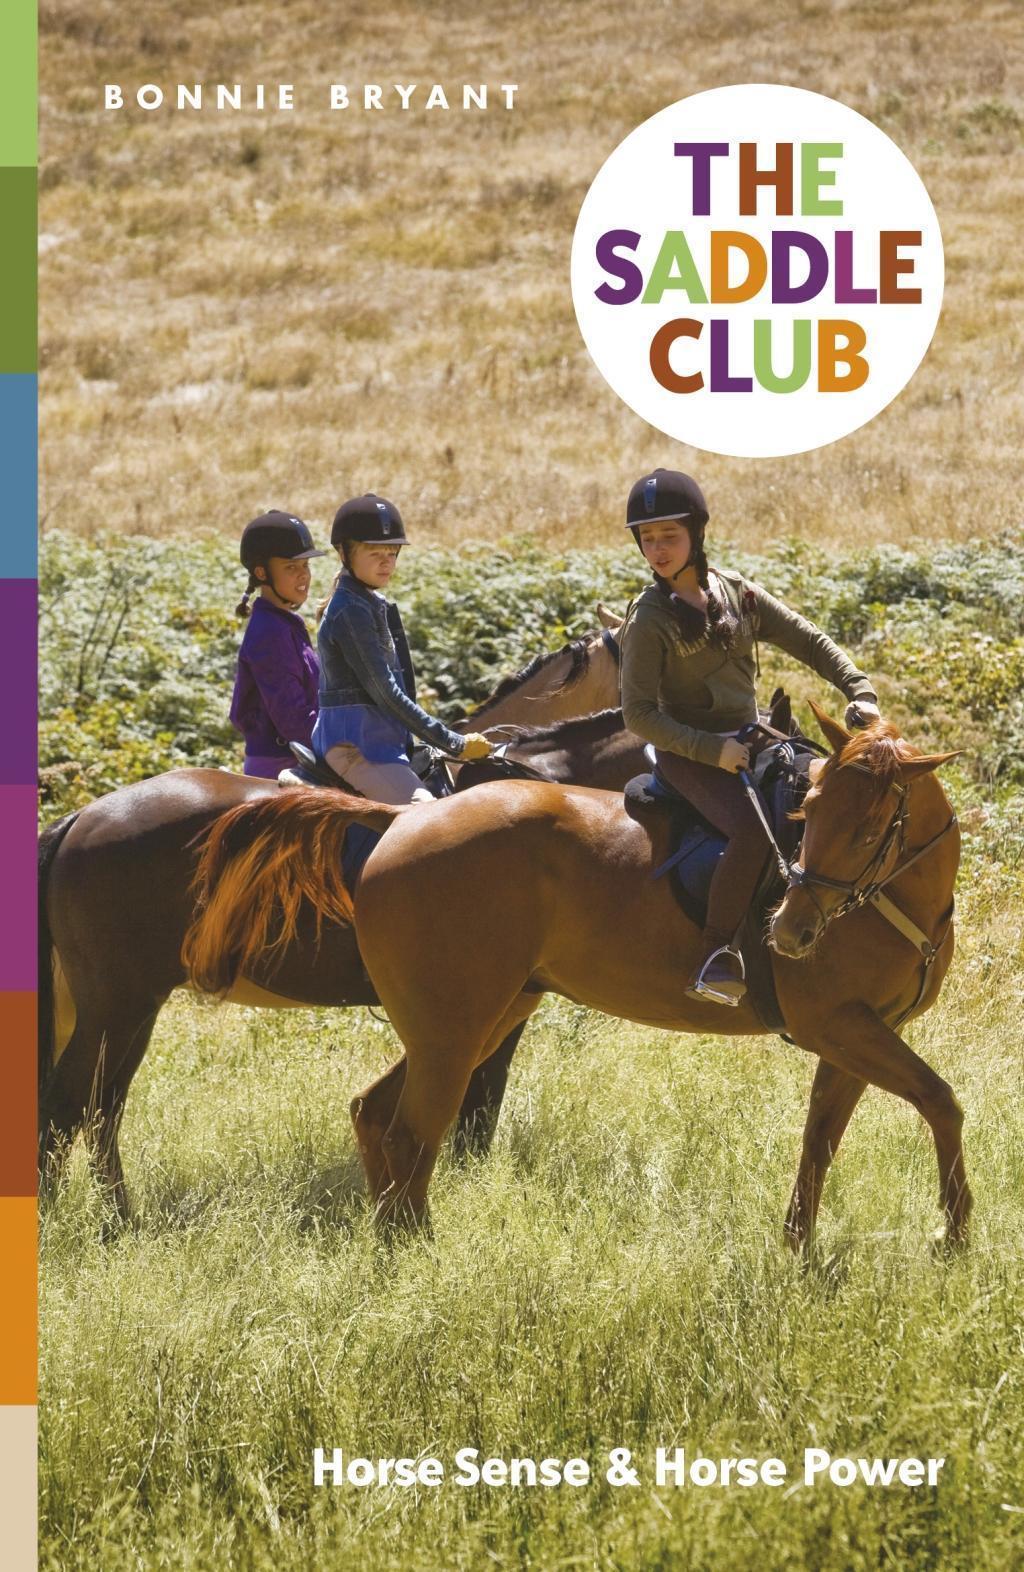 The Saddle Club: Horse Sense & Horse Power